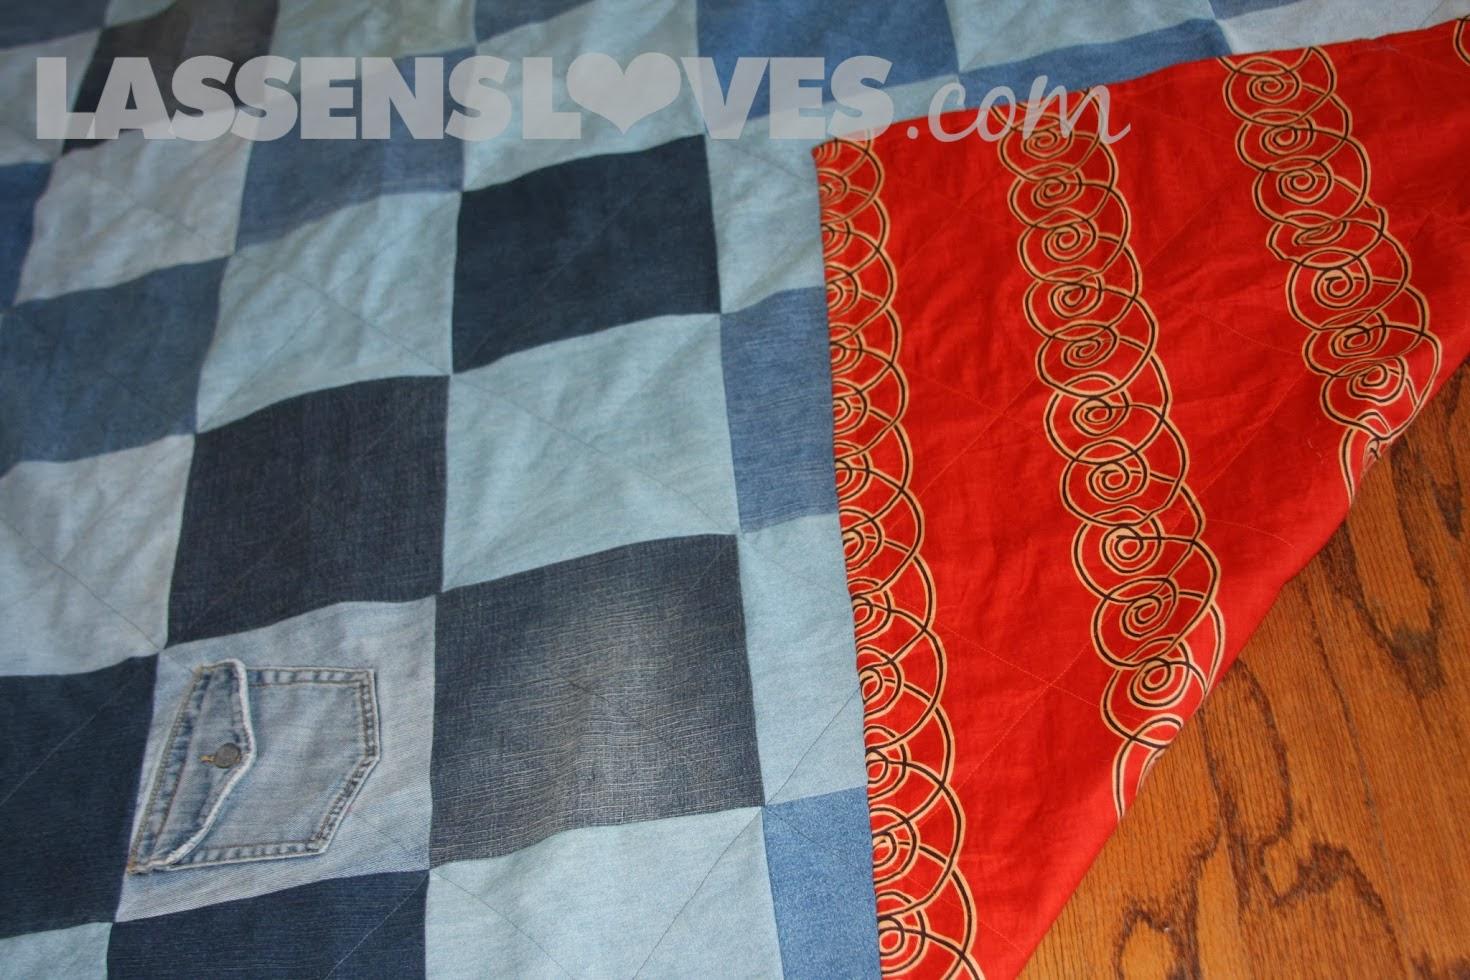 lassensloves.com, Lassen's, Lassens, jeans+blanket+, denim+blanket, up+cycle